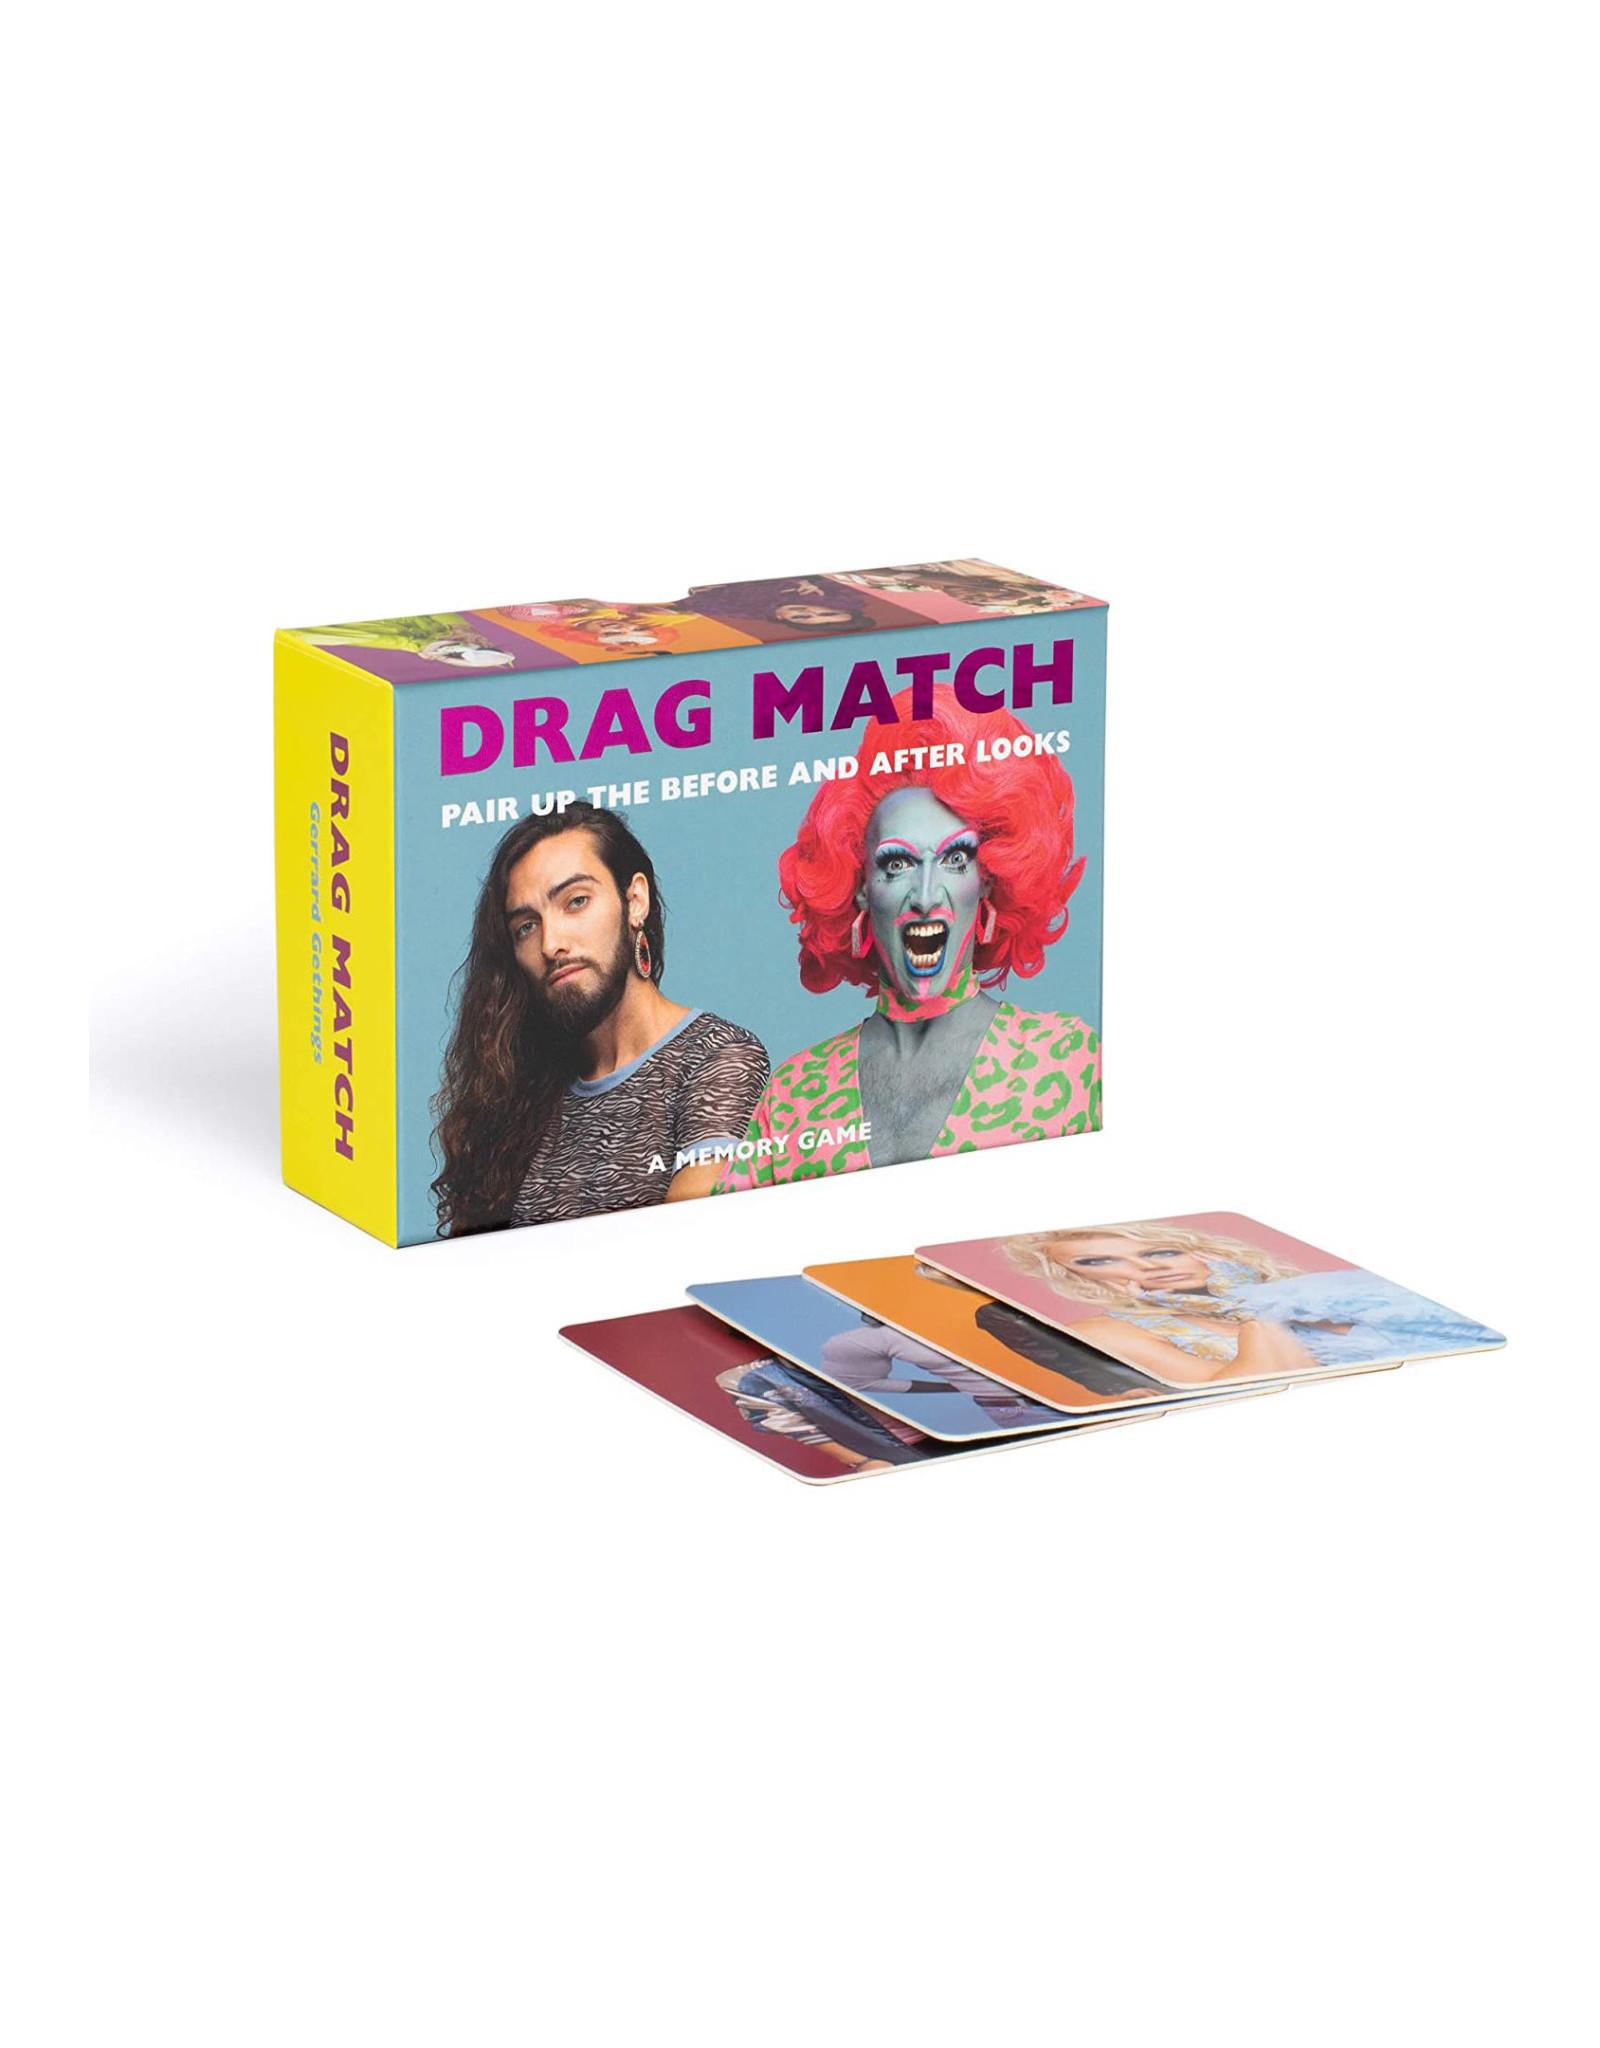 Drag Match